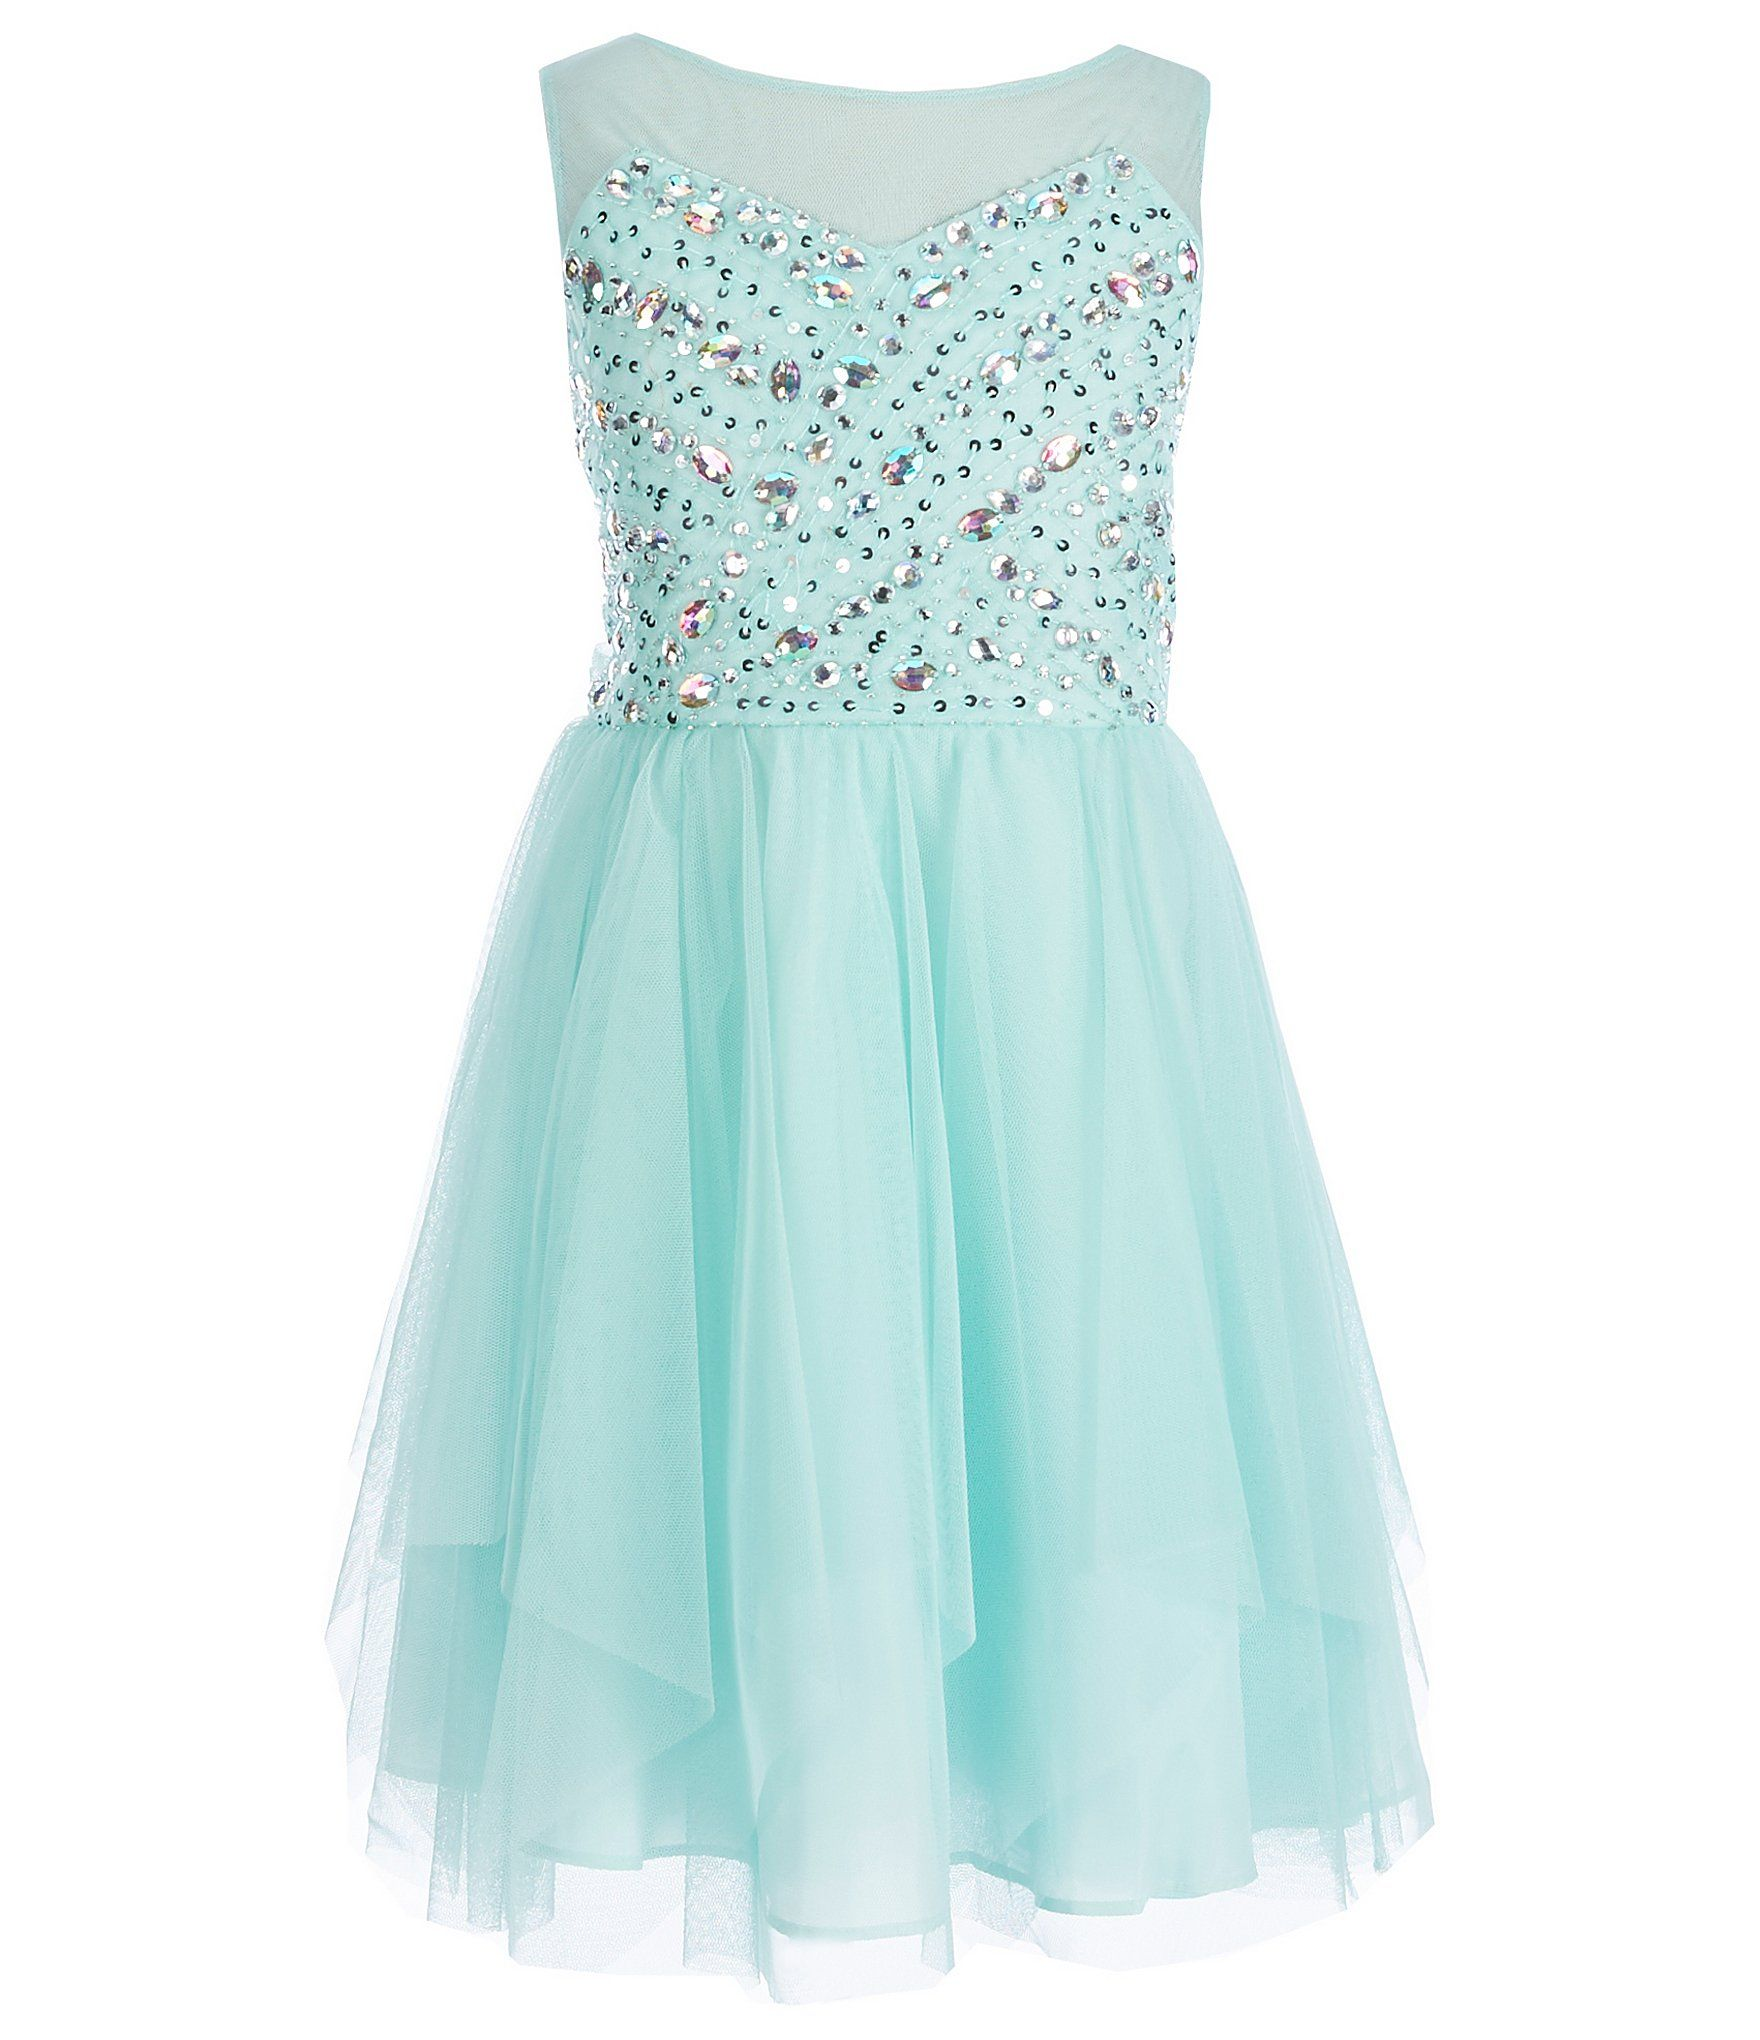 6bef8271fb1d Shop for Tween Diva Big Girls 7-16 Beaded Mesh Dress at Dillards.com. Visit  Dillards.com to find clothing